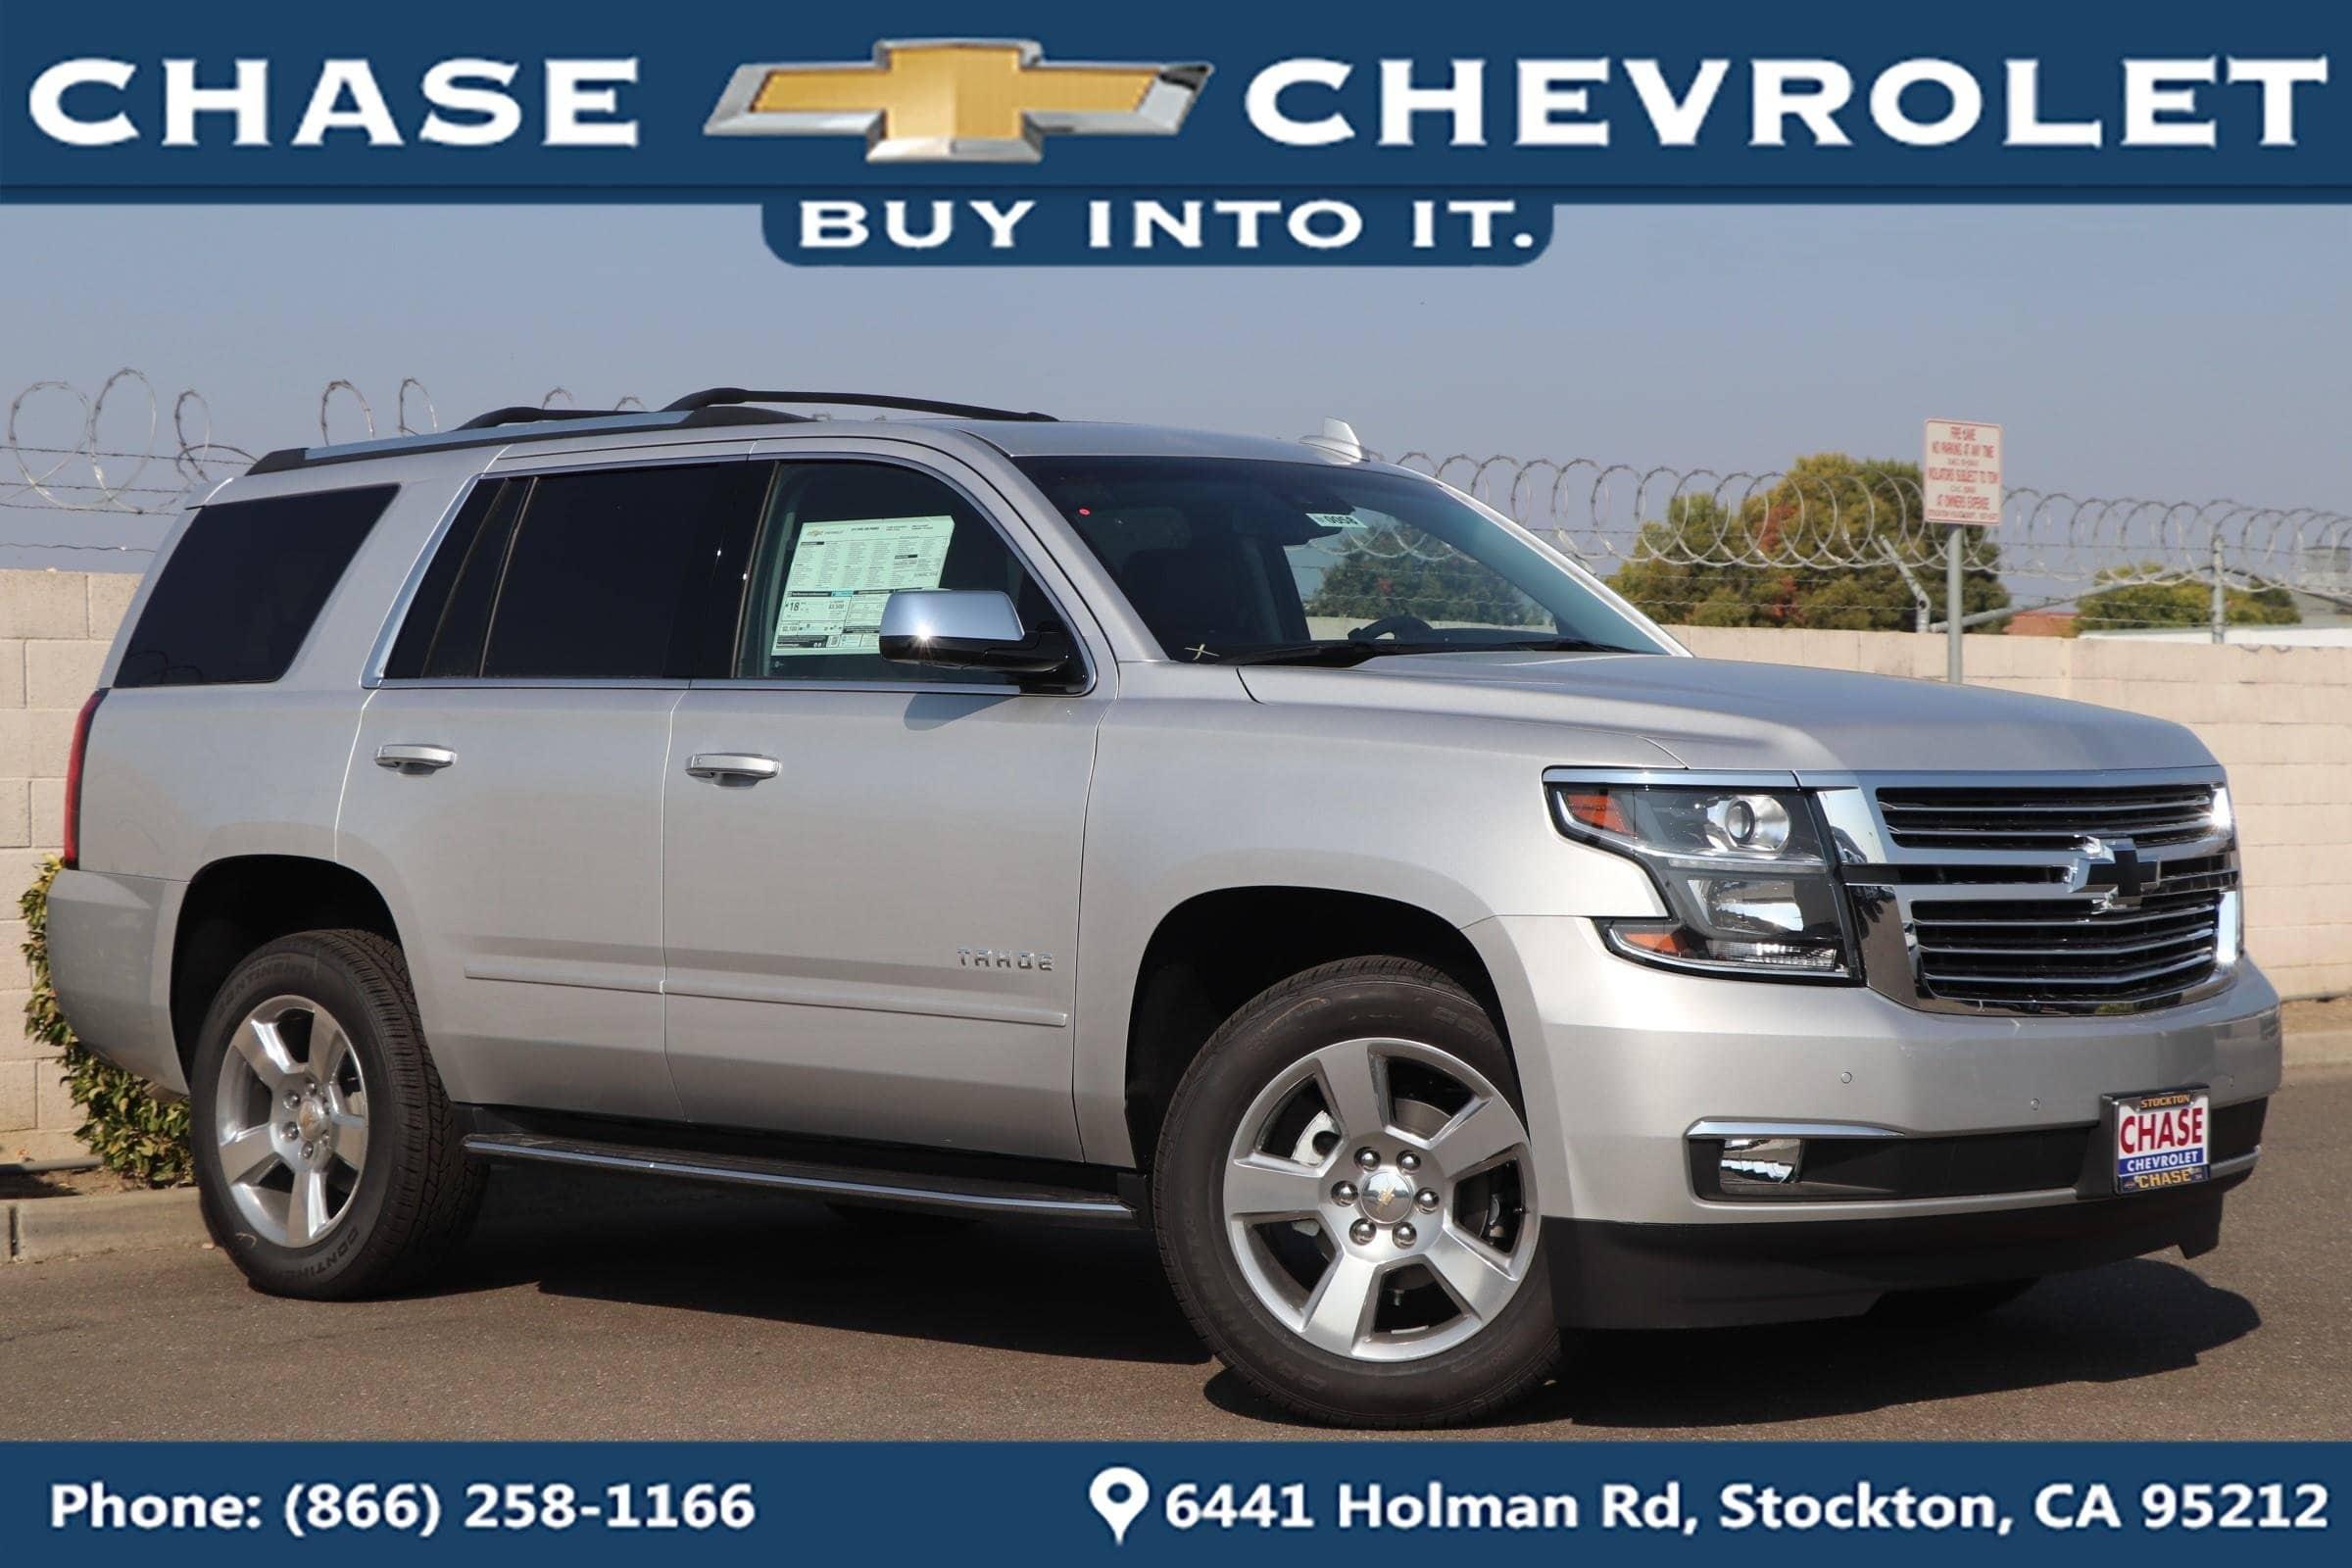 New 2019 Chevrolet Tahoe for Sale in Stockton CA